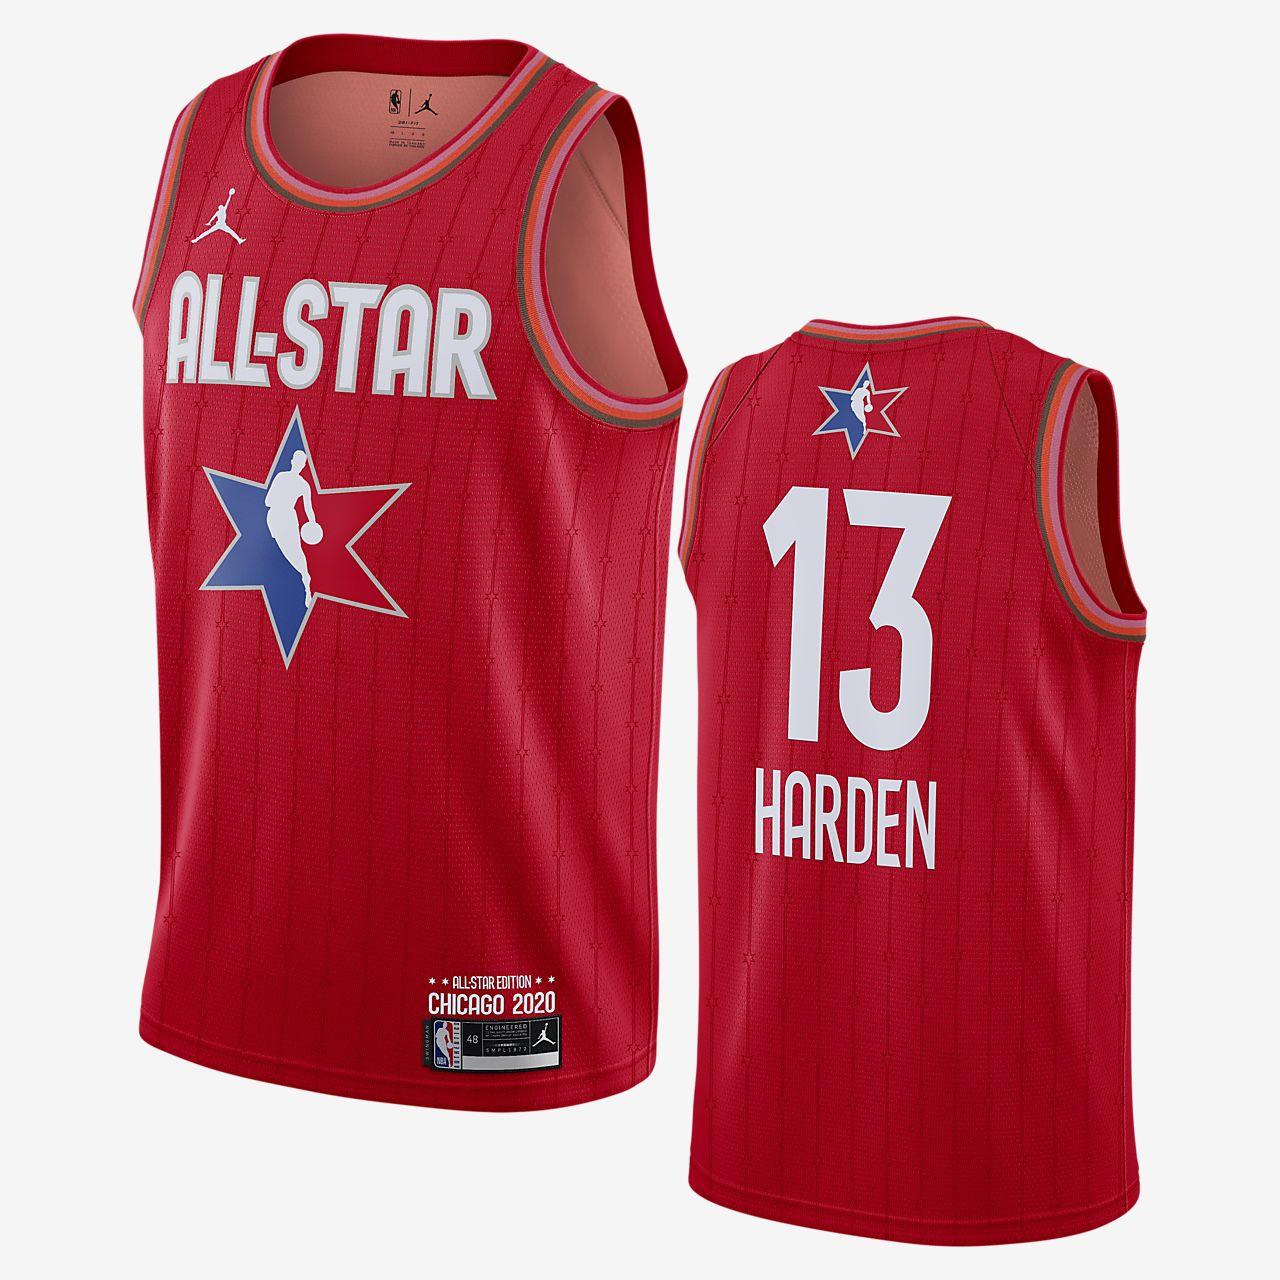 James Harden All-Star Jordan NBA Swingman Jersey